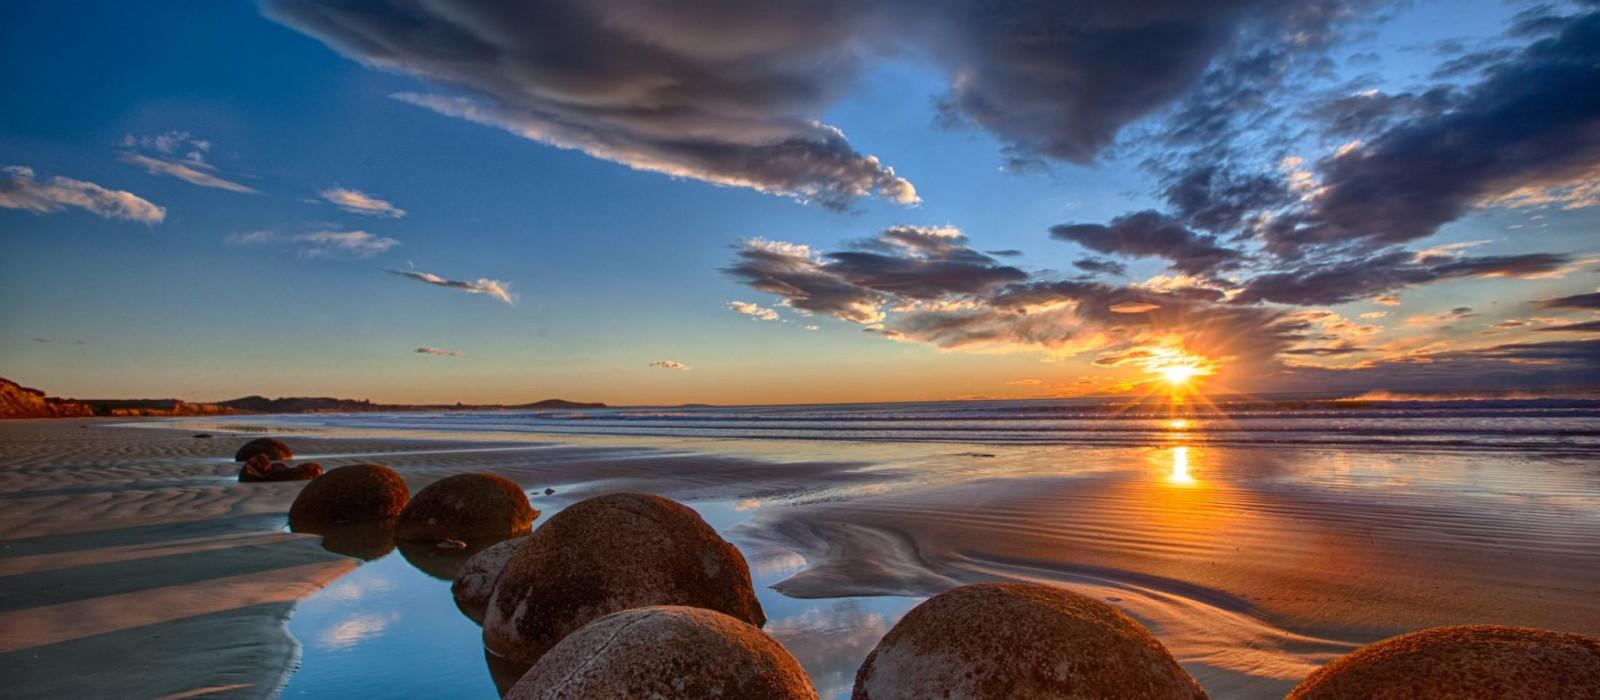 Destination Oamaru New Zealand